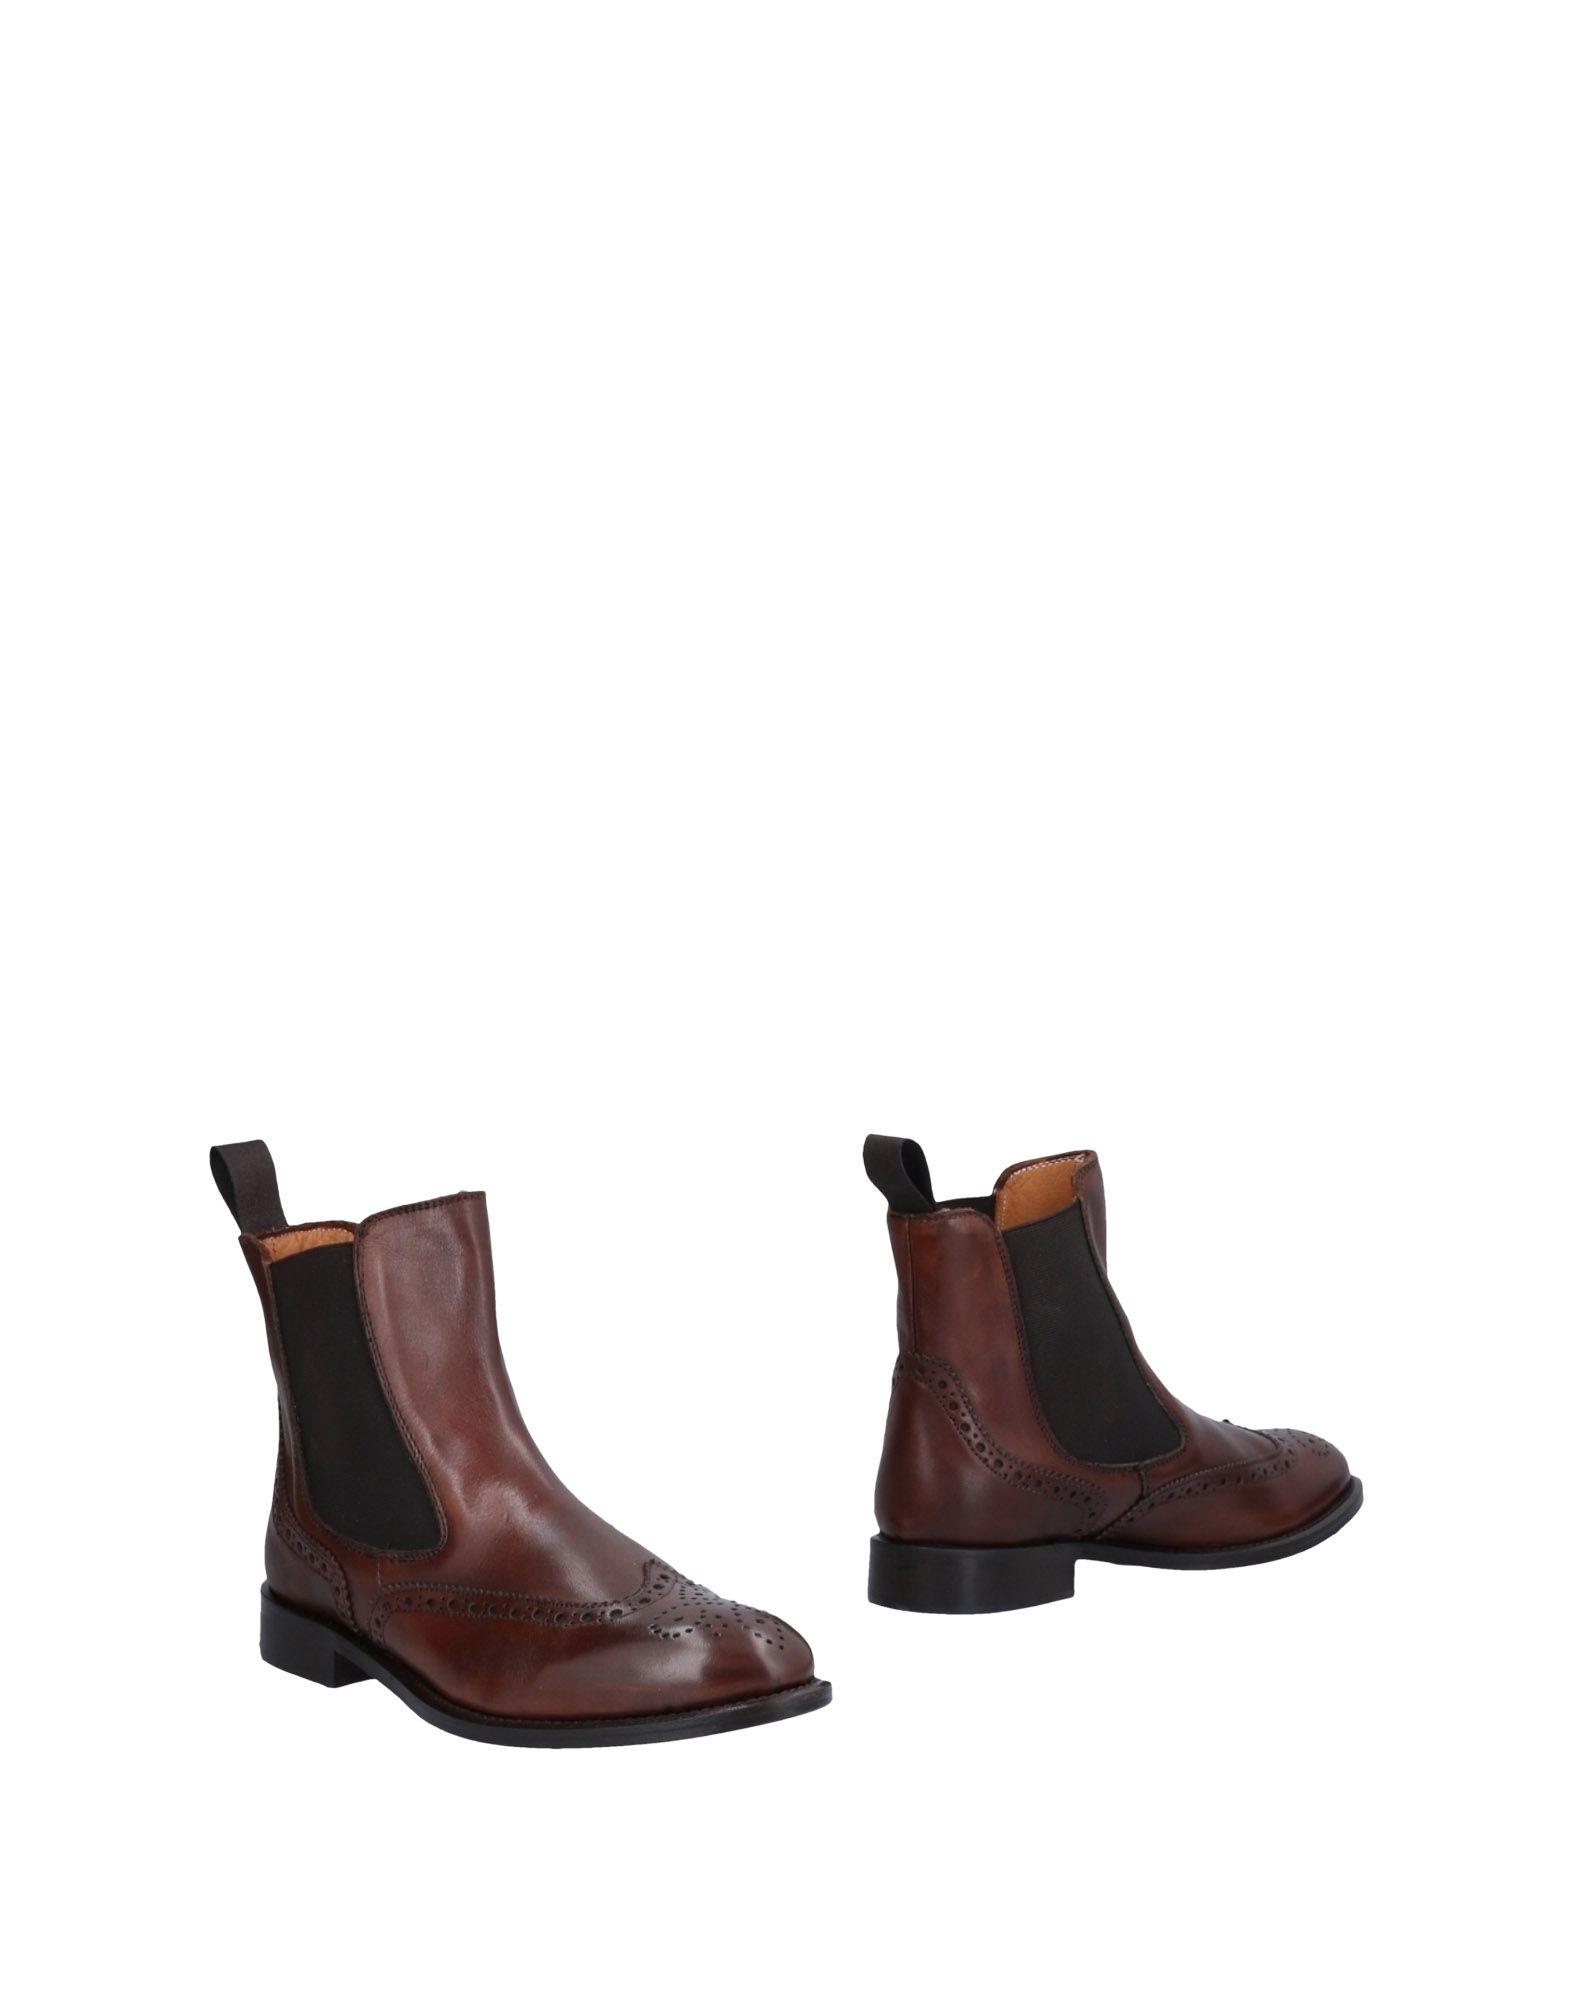 Gut Chelsea um billige Schuhe zu tragenDevon Chelsea Gut Boots Damen  11491249XS 3cbf8e